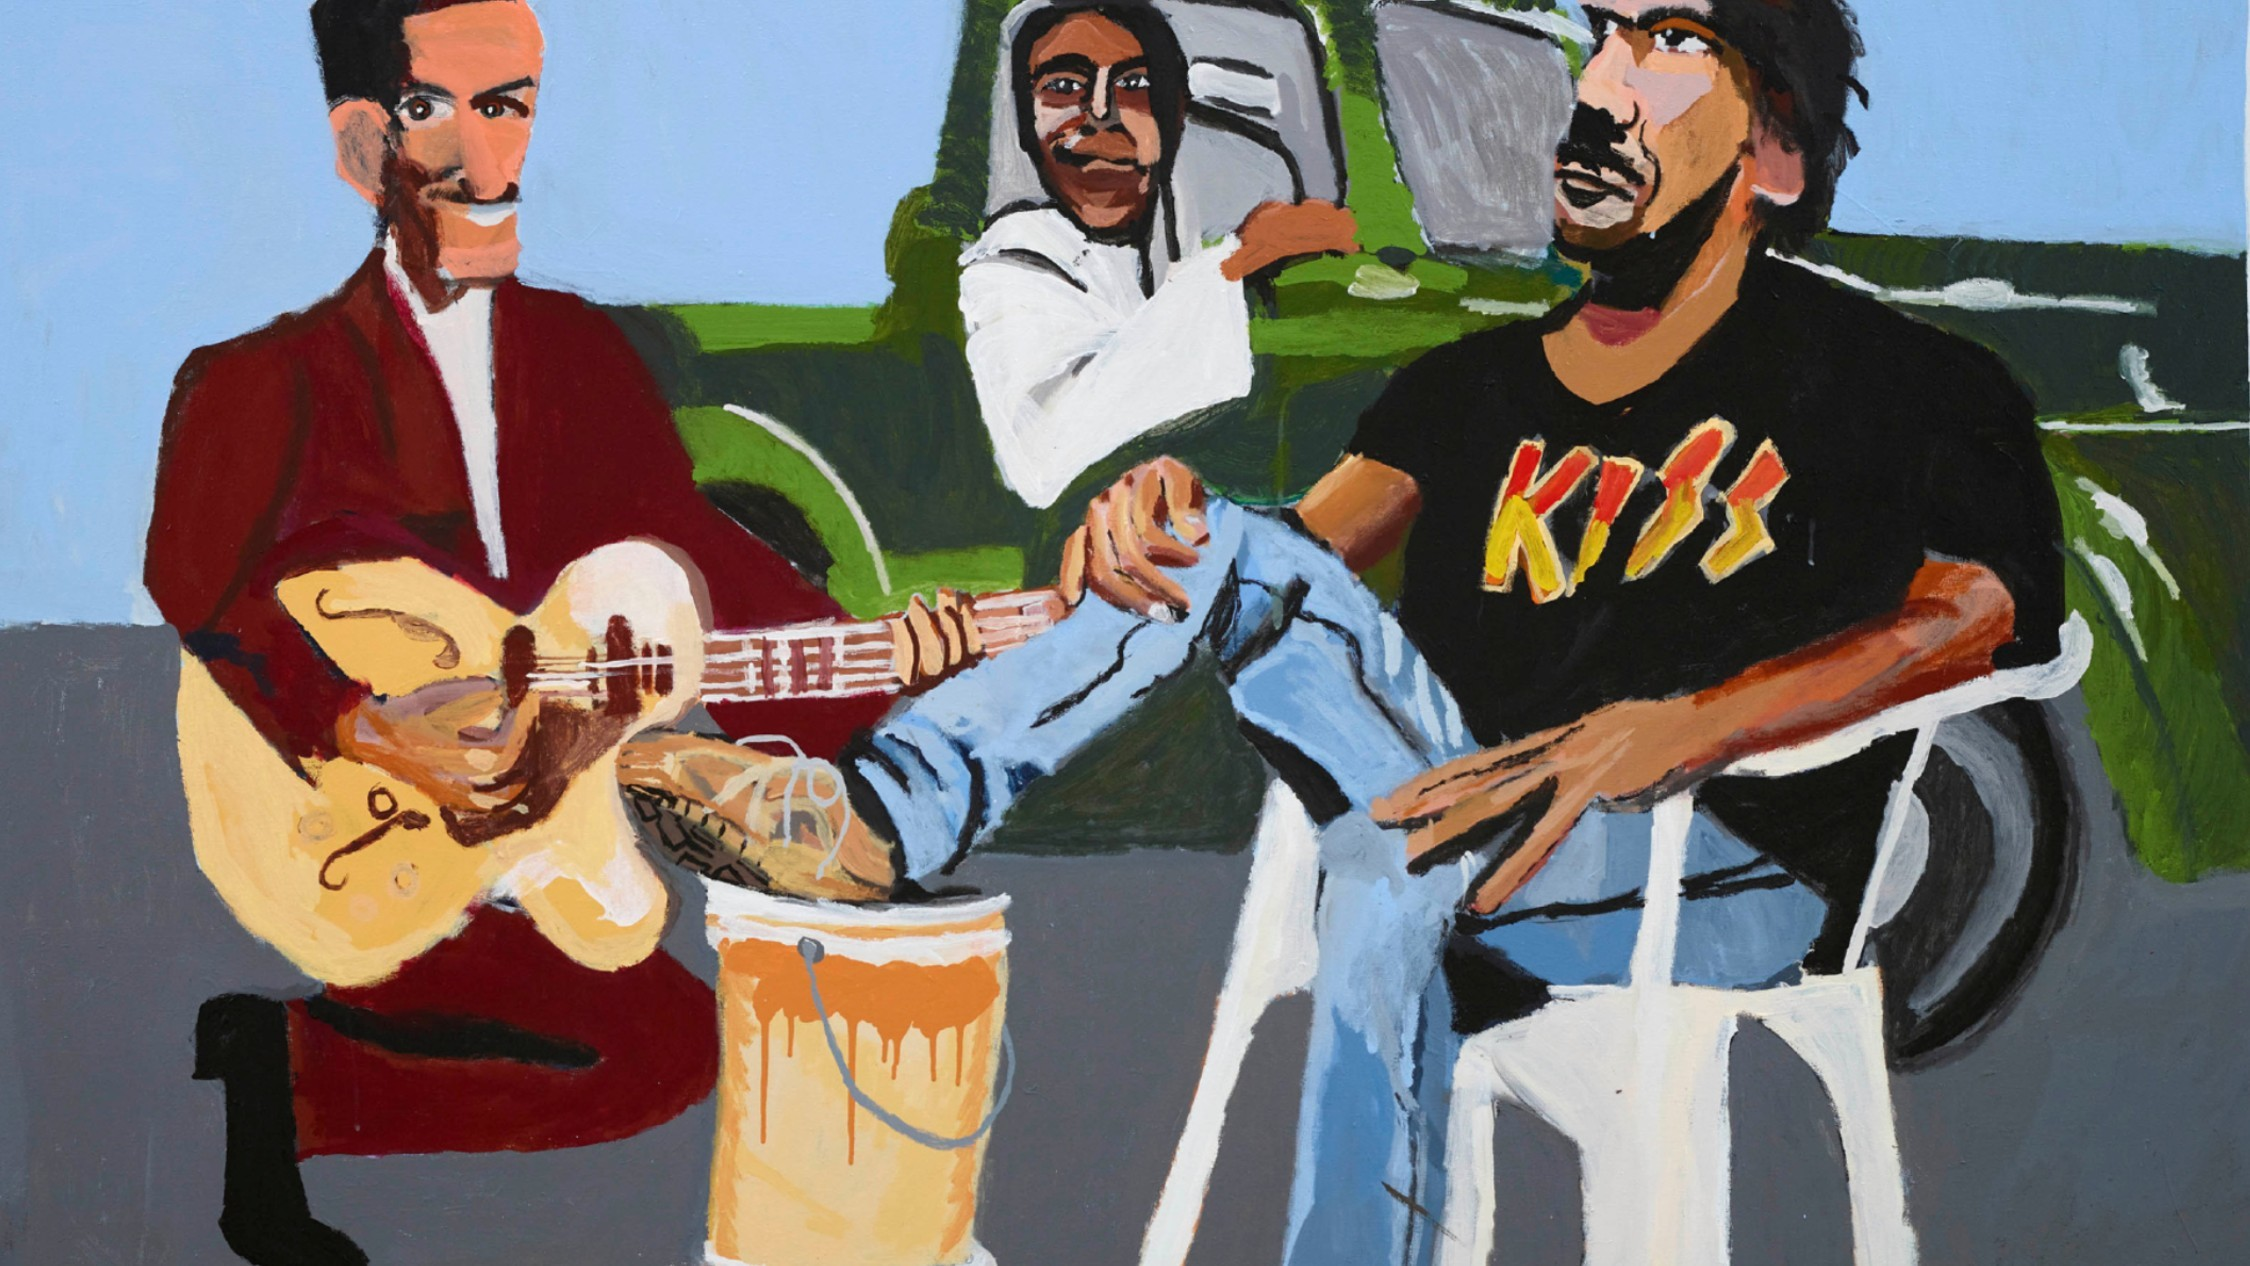 A self-portrait of artist Vincent Namatjira and friends